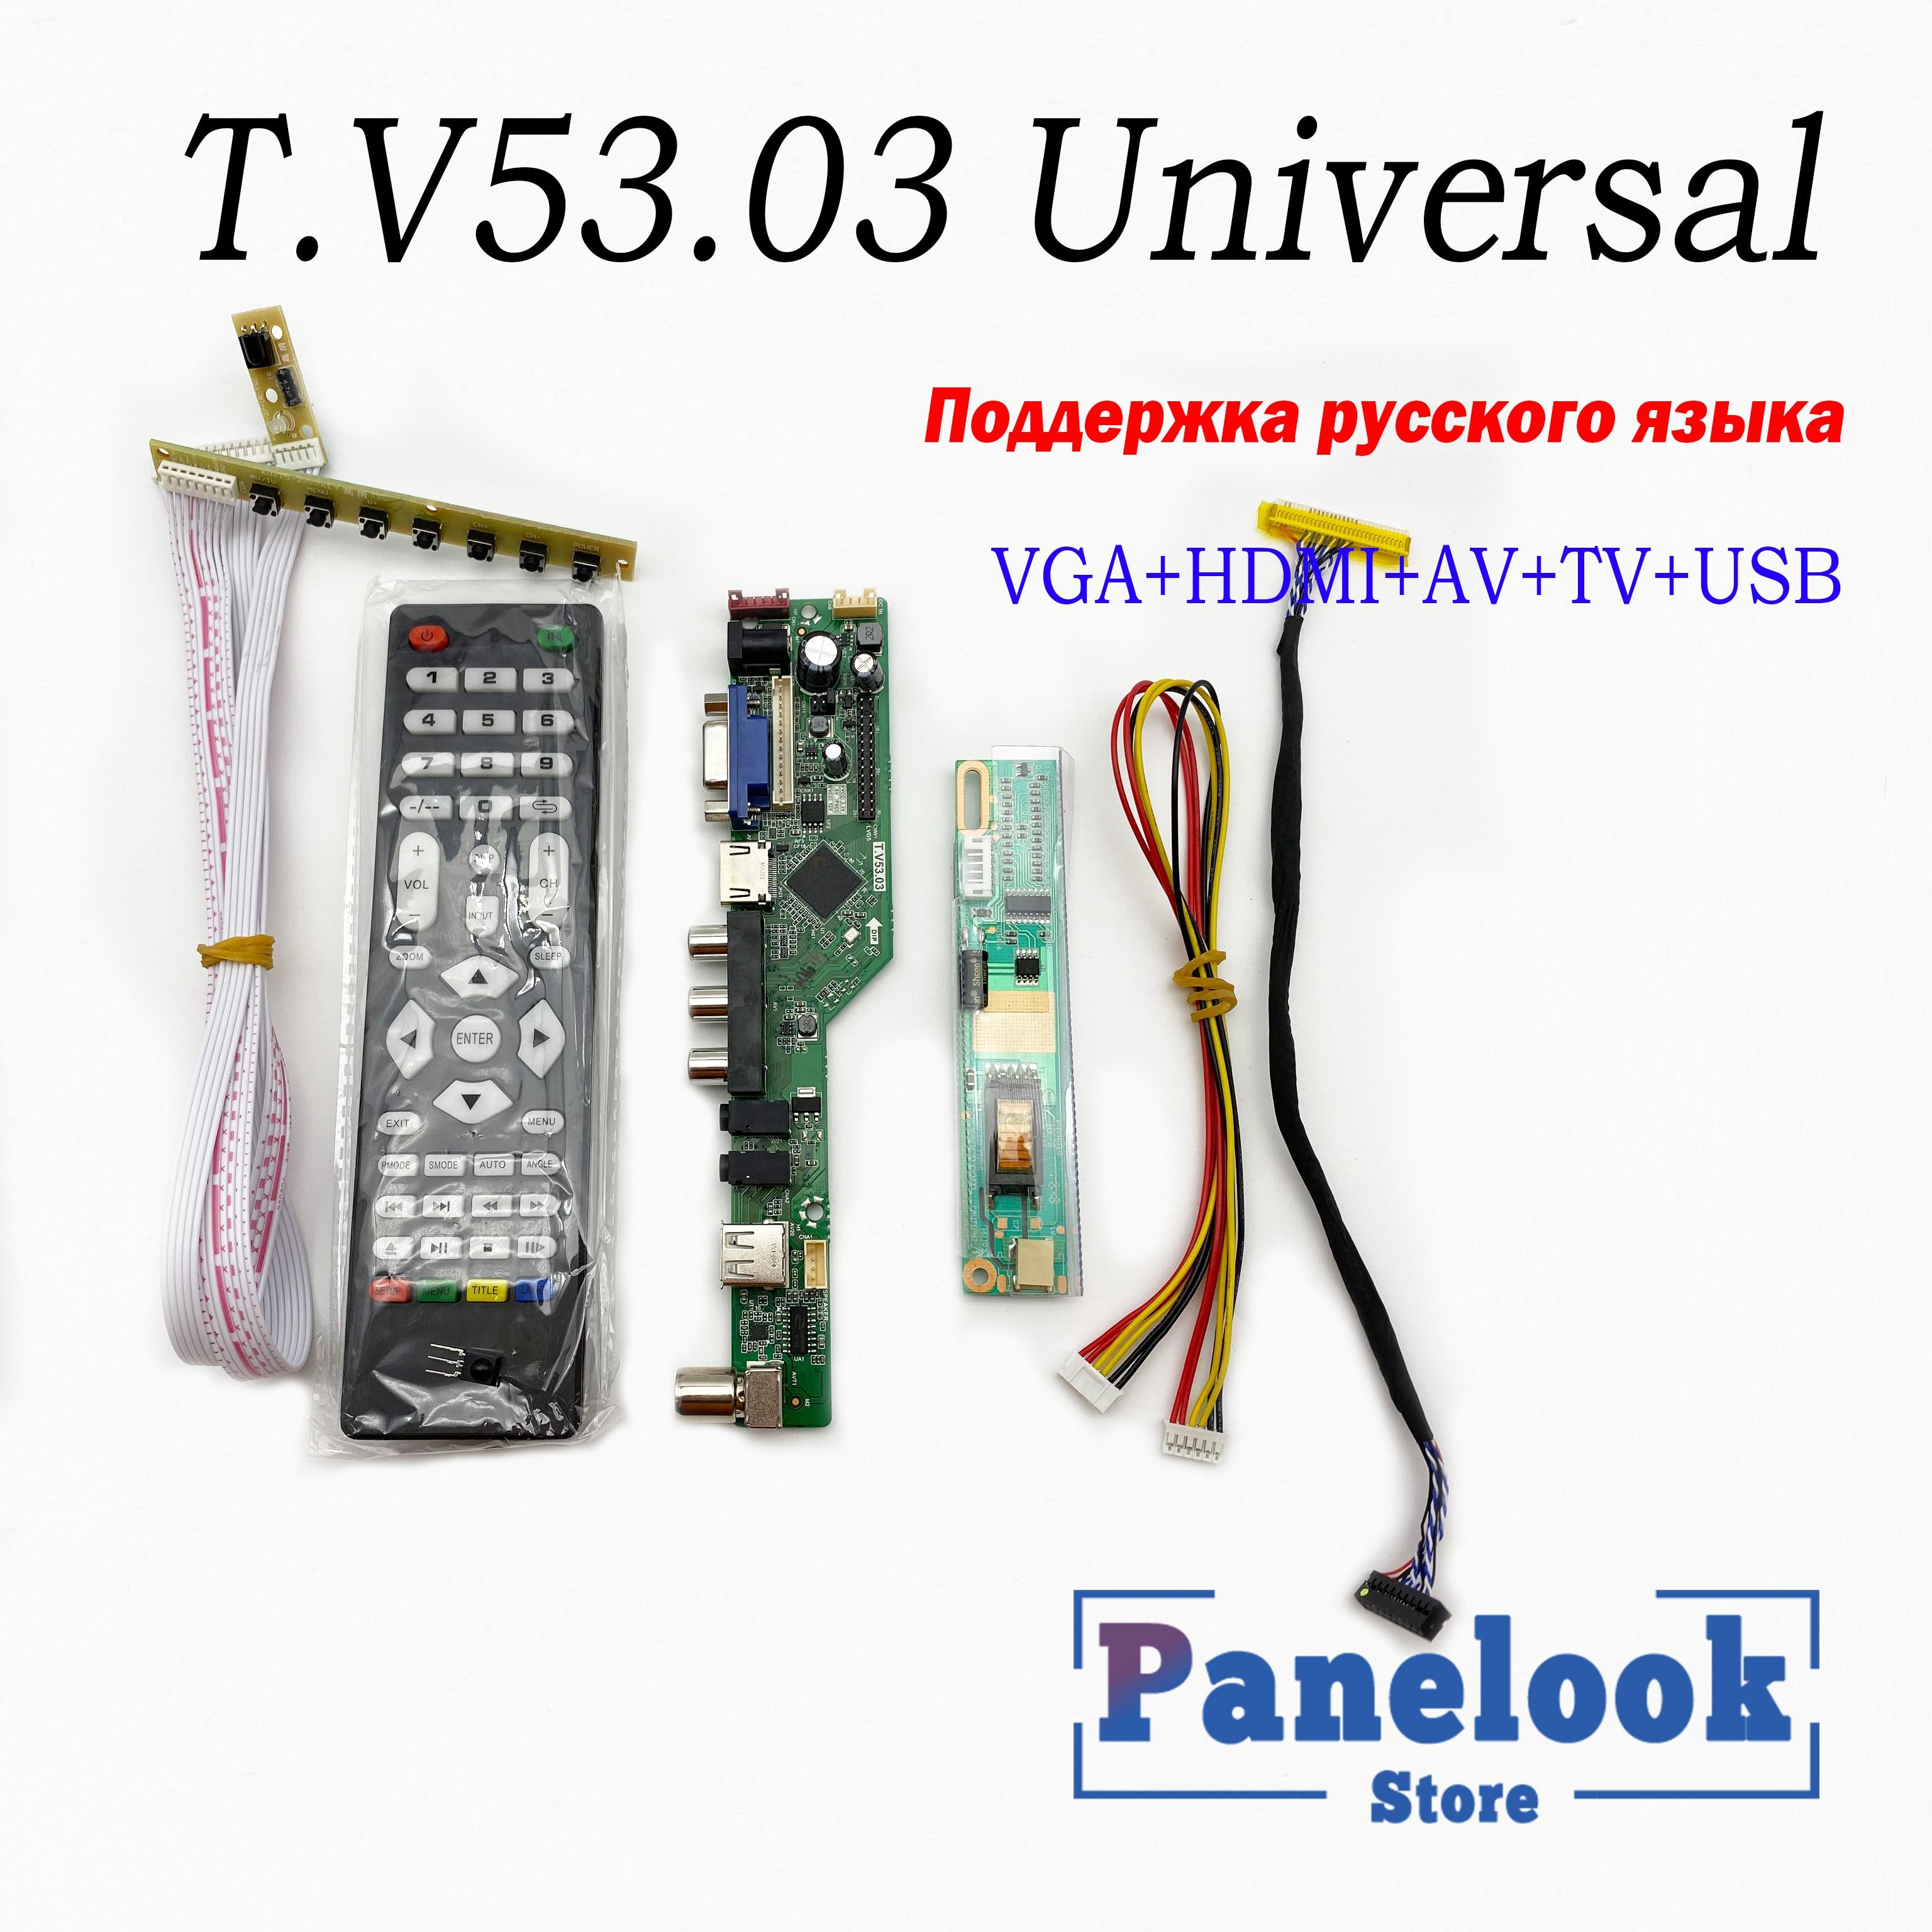 T.V53.03 Universal LCD TV Controller Driver Board PC/VGA/HDMI/USB Interface+7 Key Board+ 1 Lamp Inverter